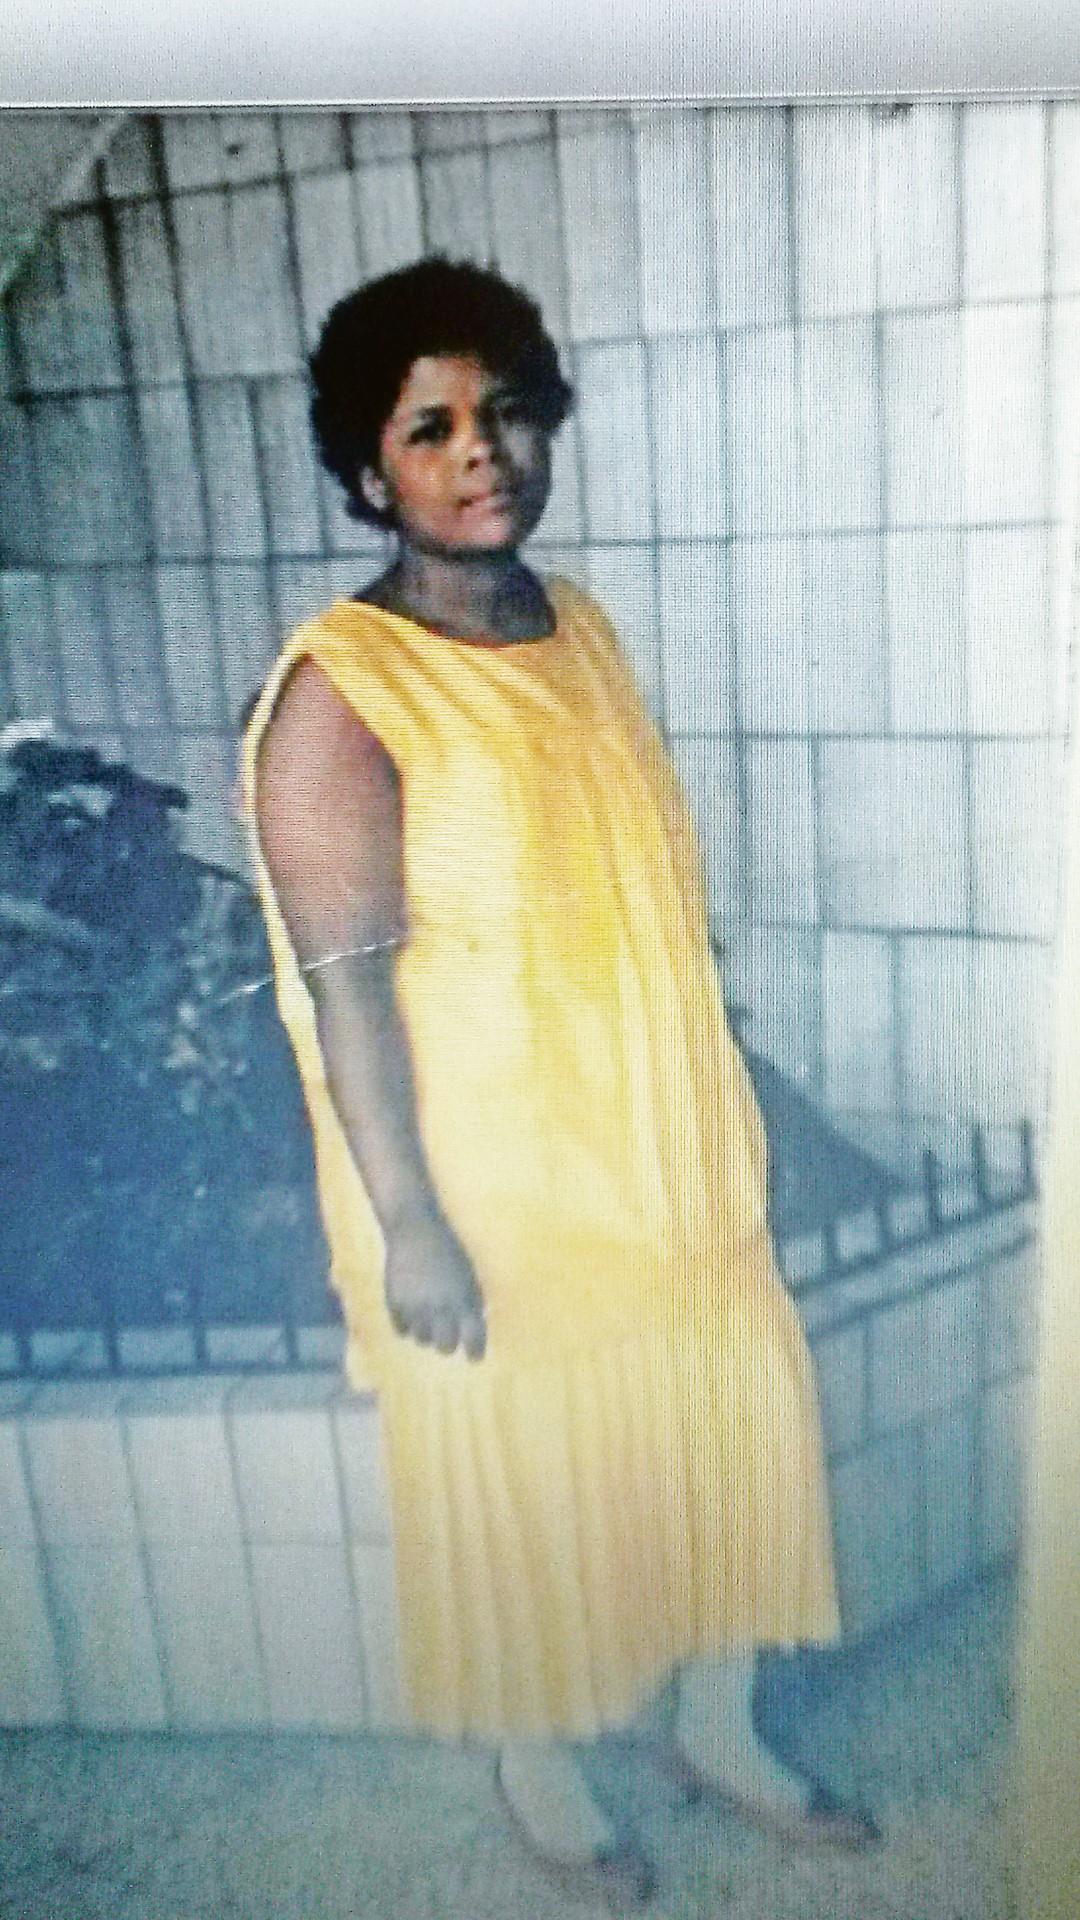 The missing Sibi Irene Ndiyaza.